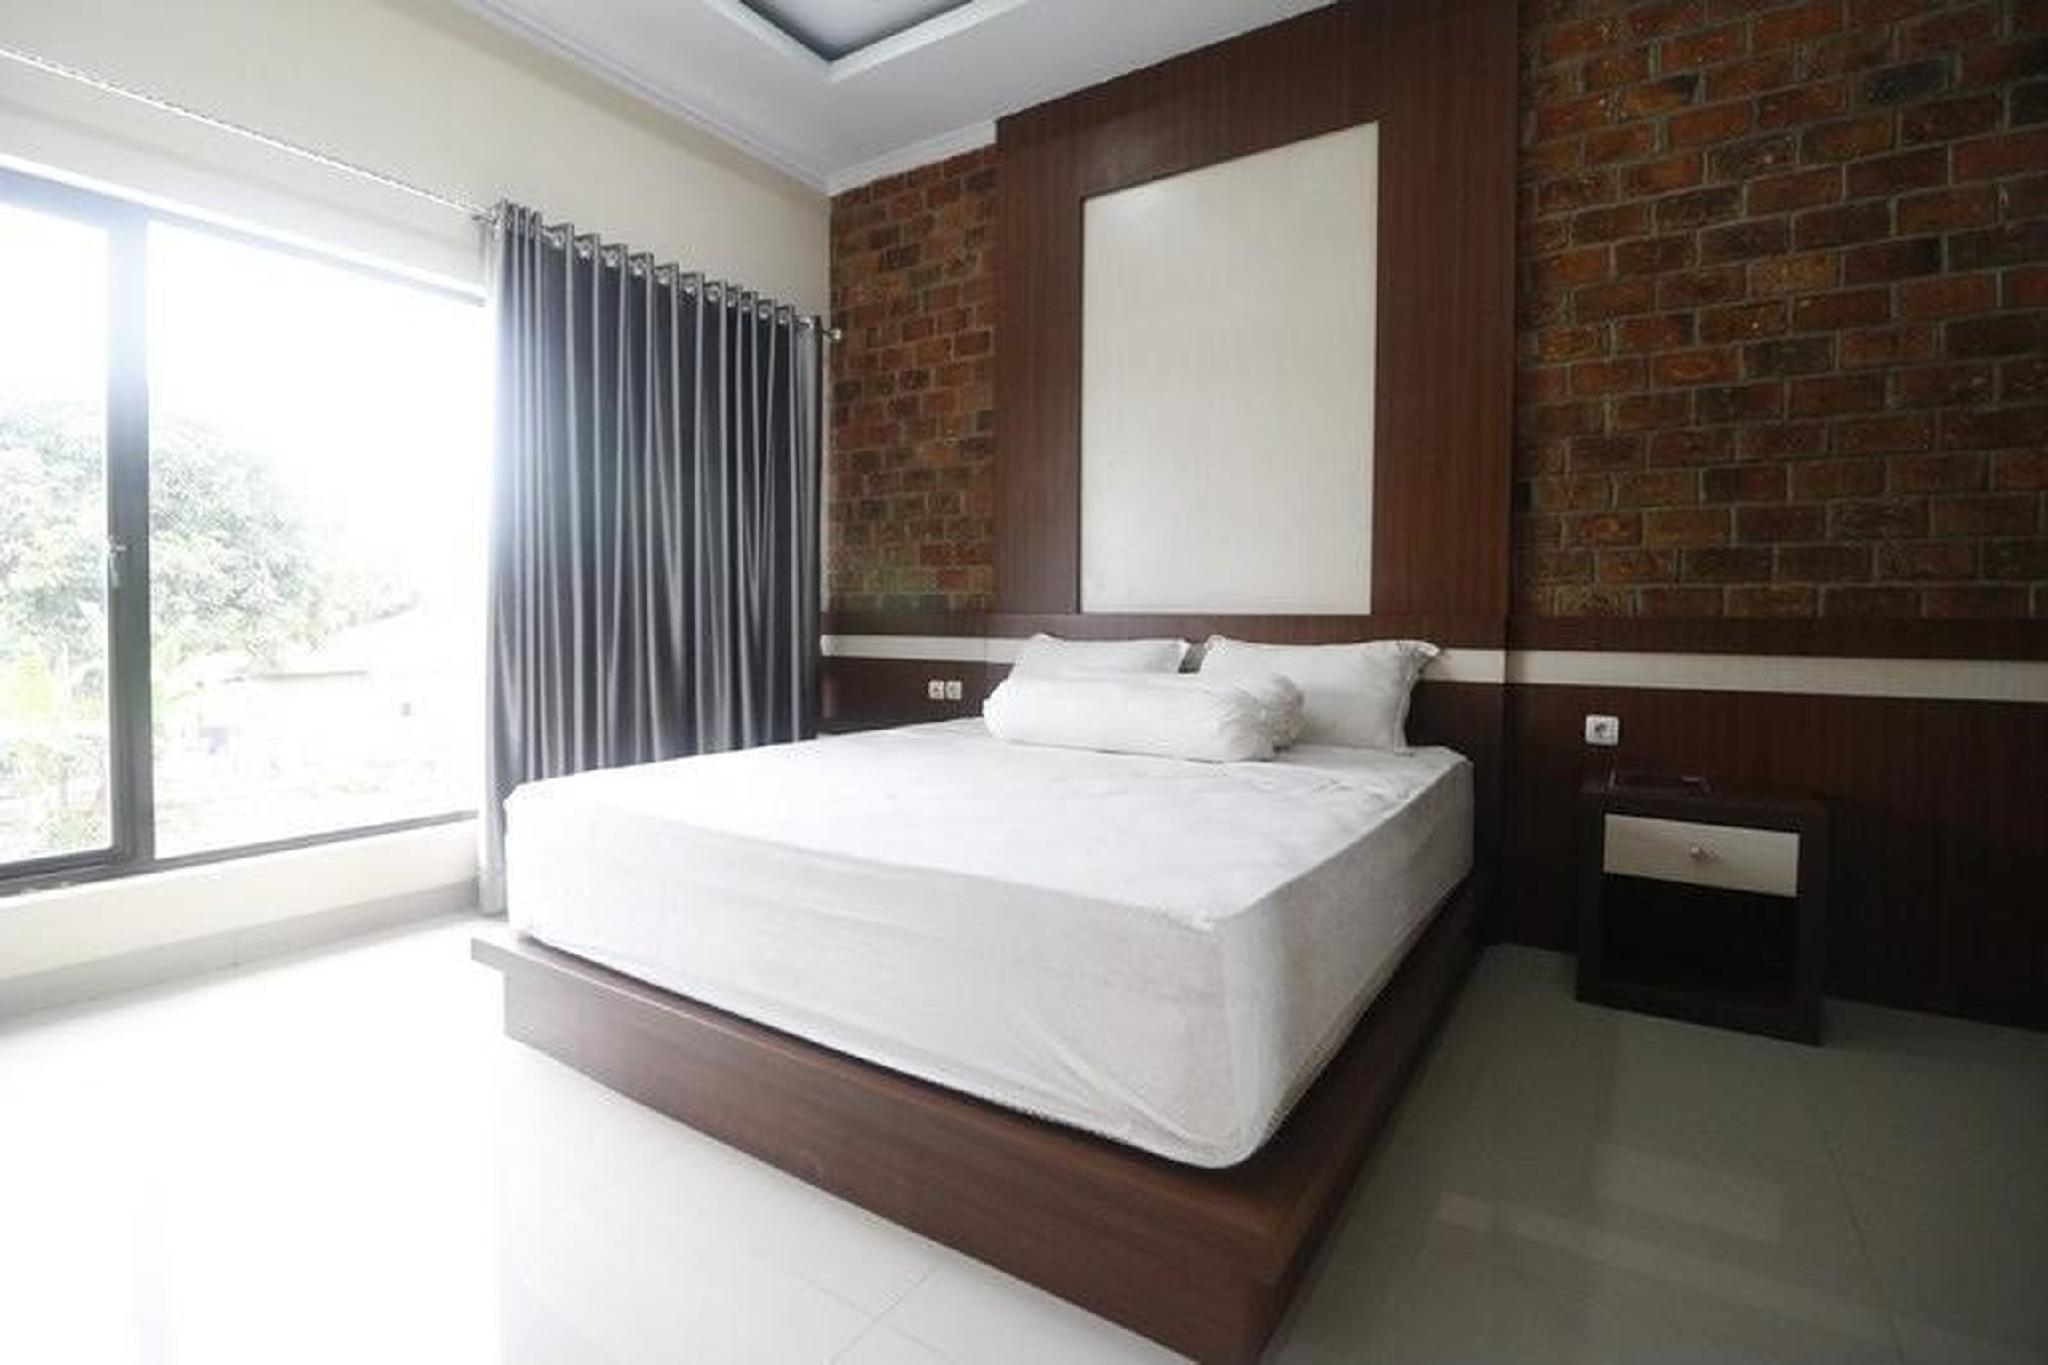 Studio Rumah Kost Kualanamu   Room 10